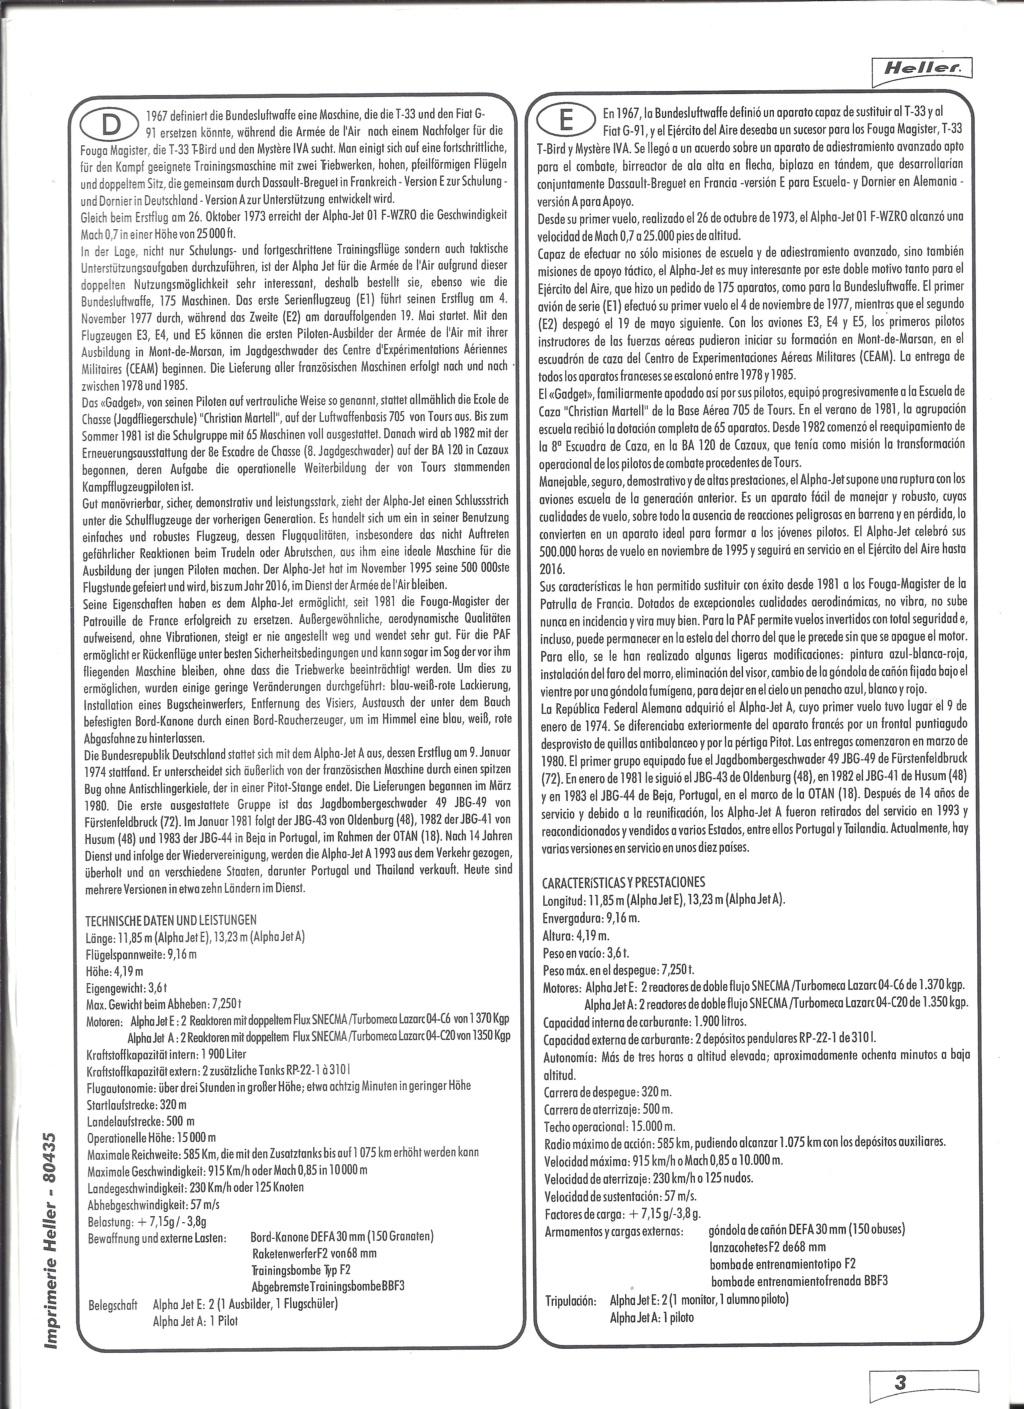 DASSAULT-BREGUET DORNIER ALPHA JET 1/48ème Réf 80435 Notice Helle658